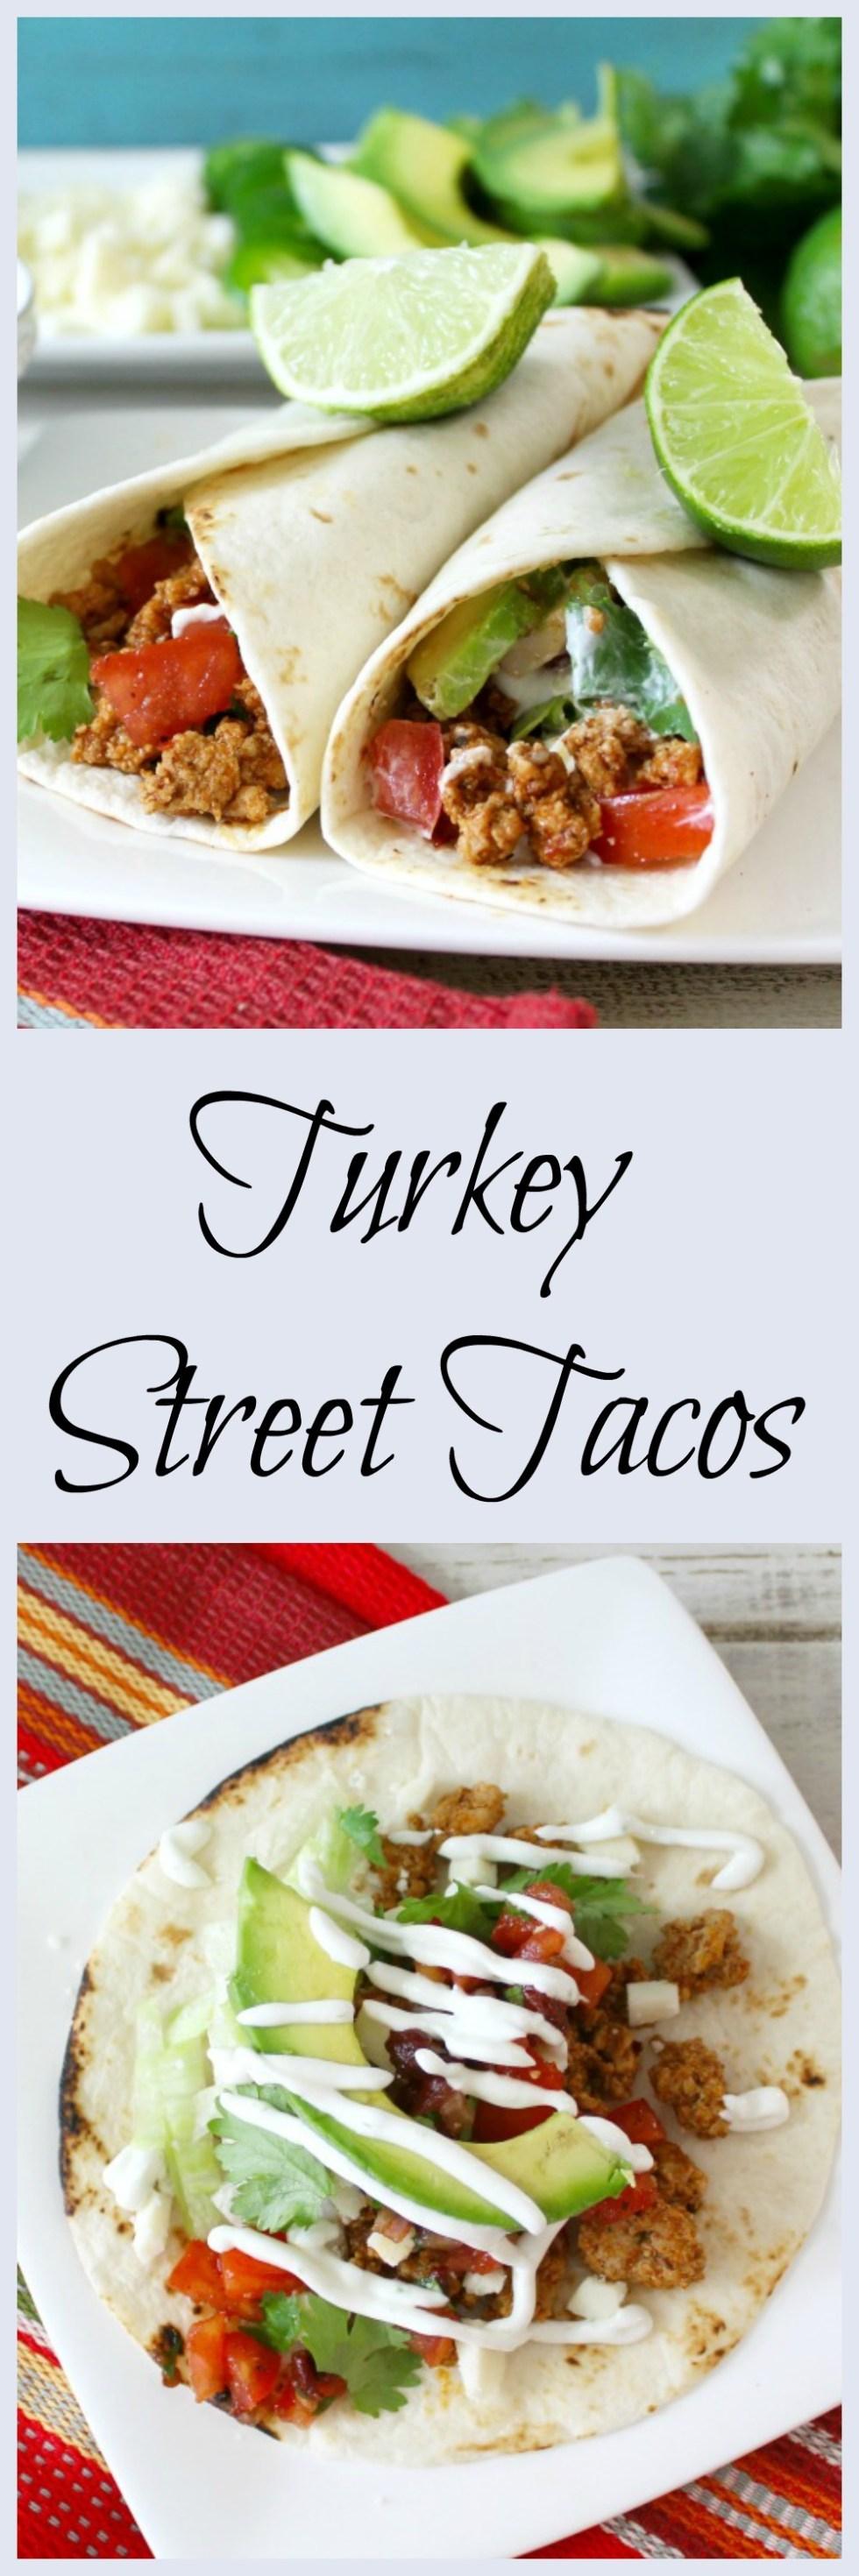 Turkey Street Tacos #TurkeyTuesday